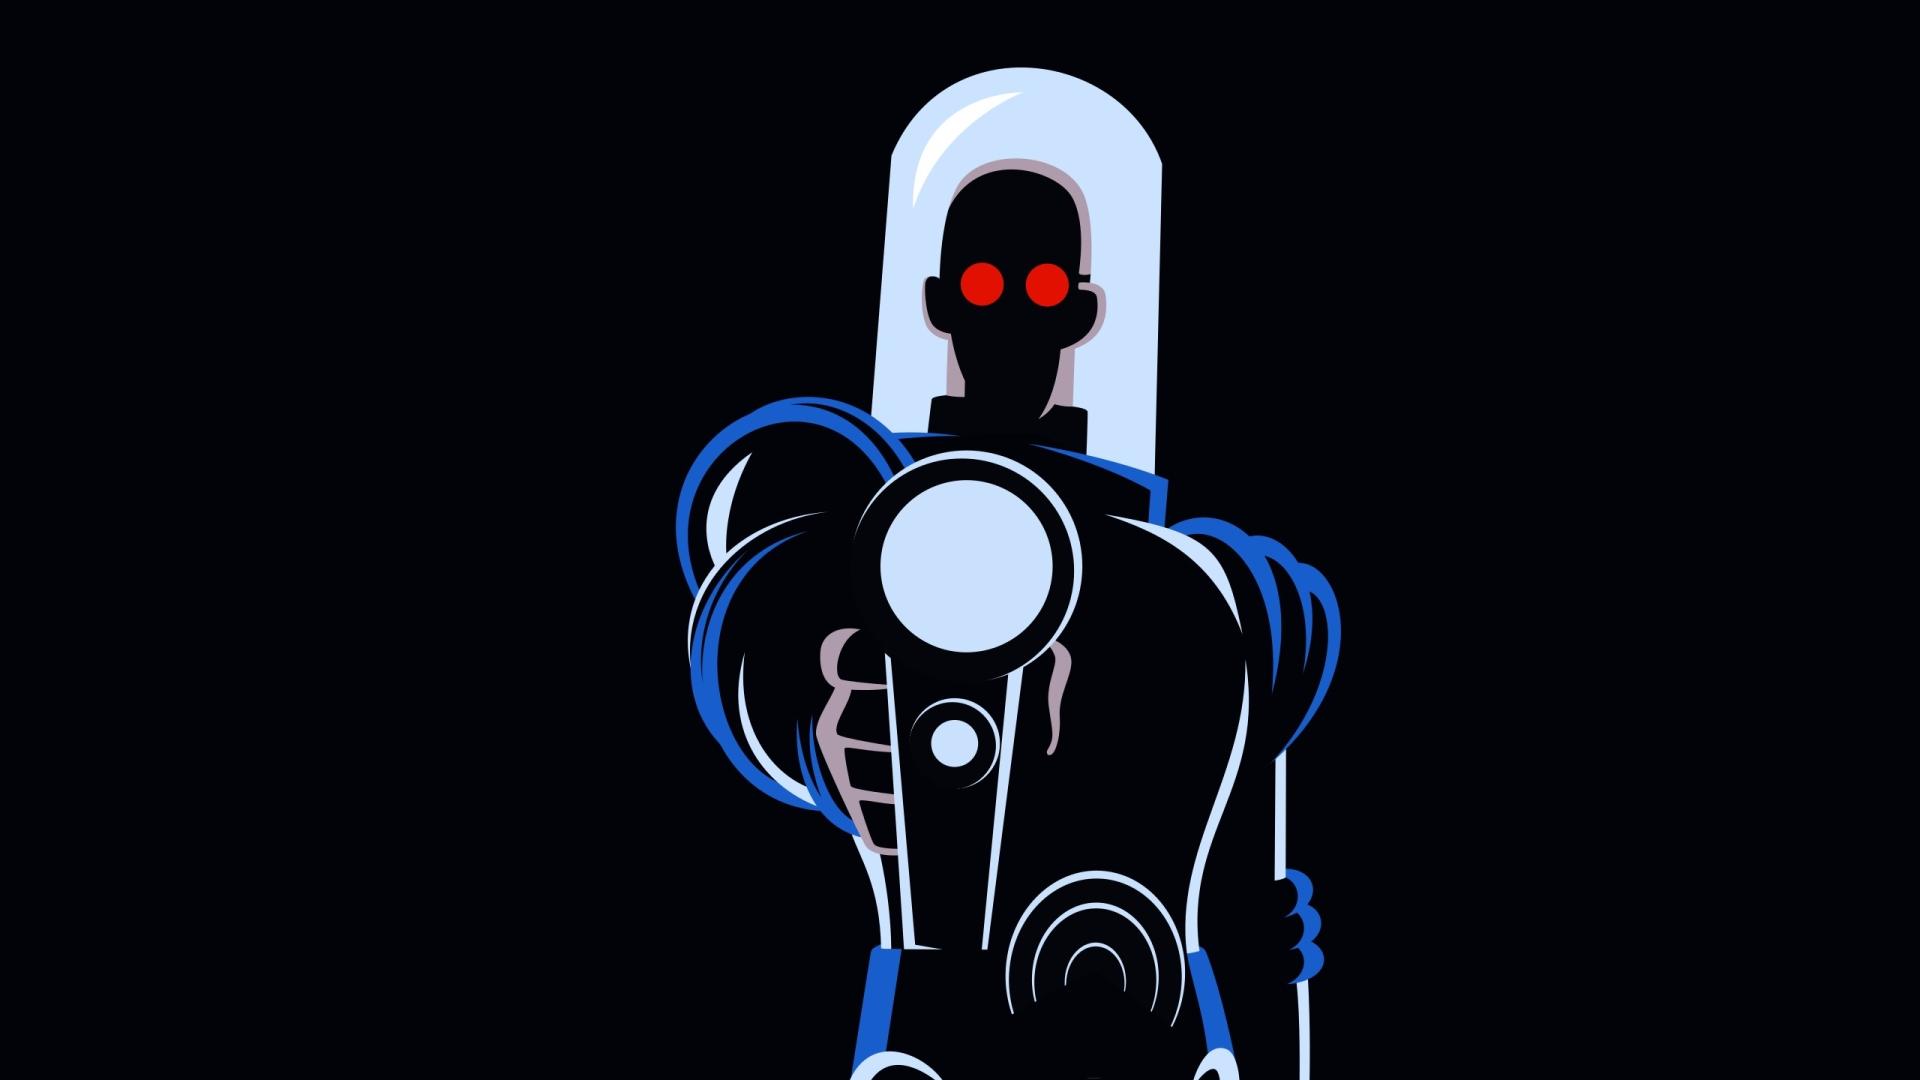 1920x1080 Mr Freeze Batman The Animated Series 1080p Laptop